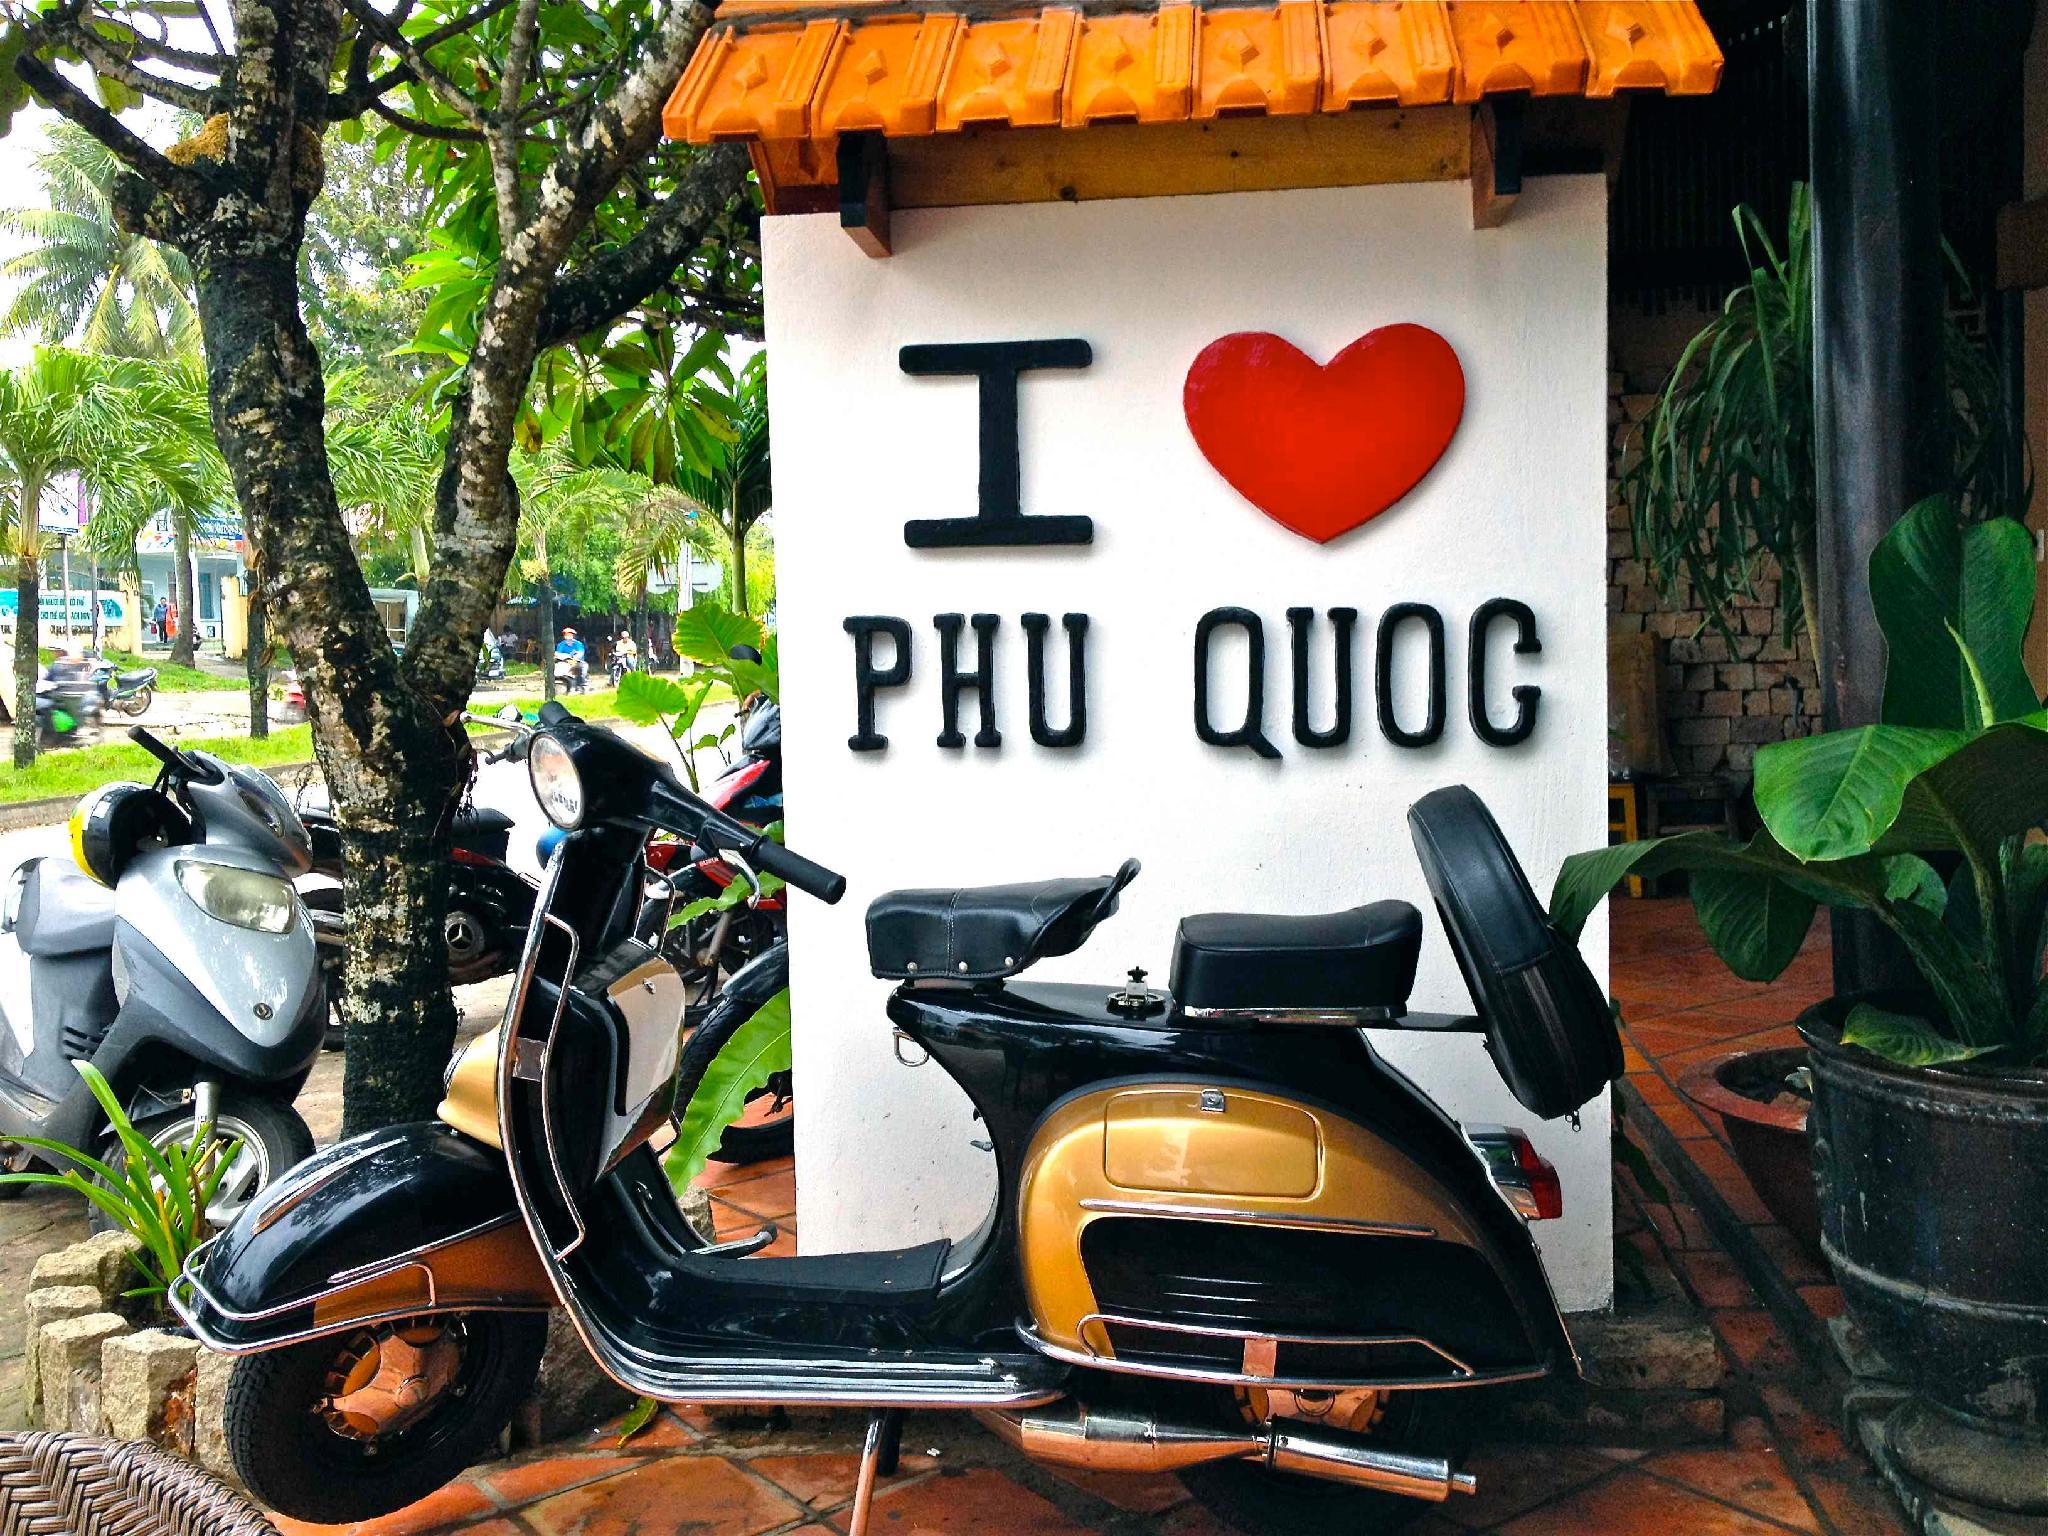 The Safari Phu Quoc House